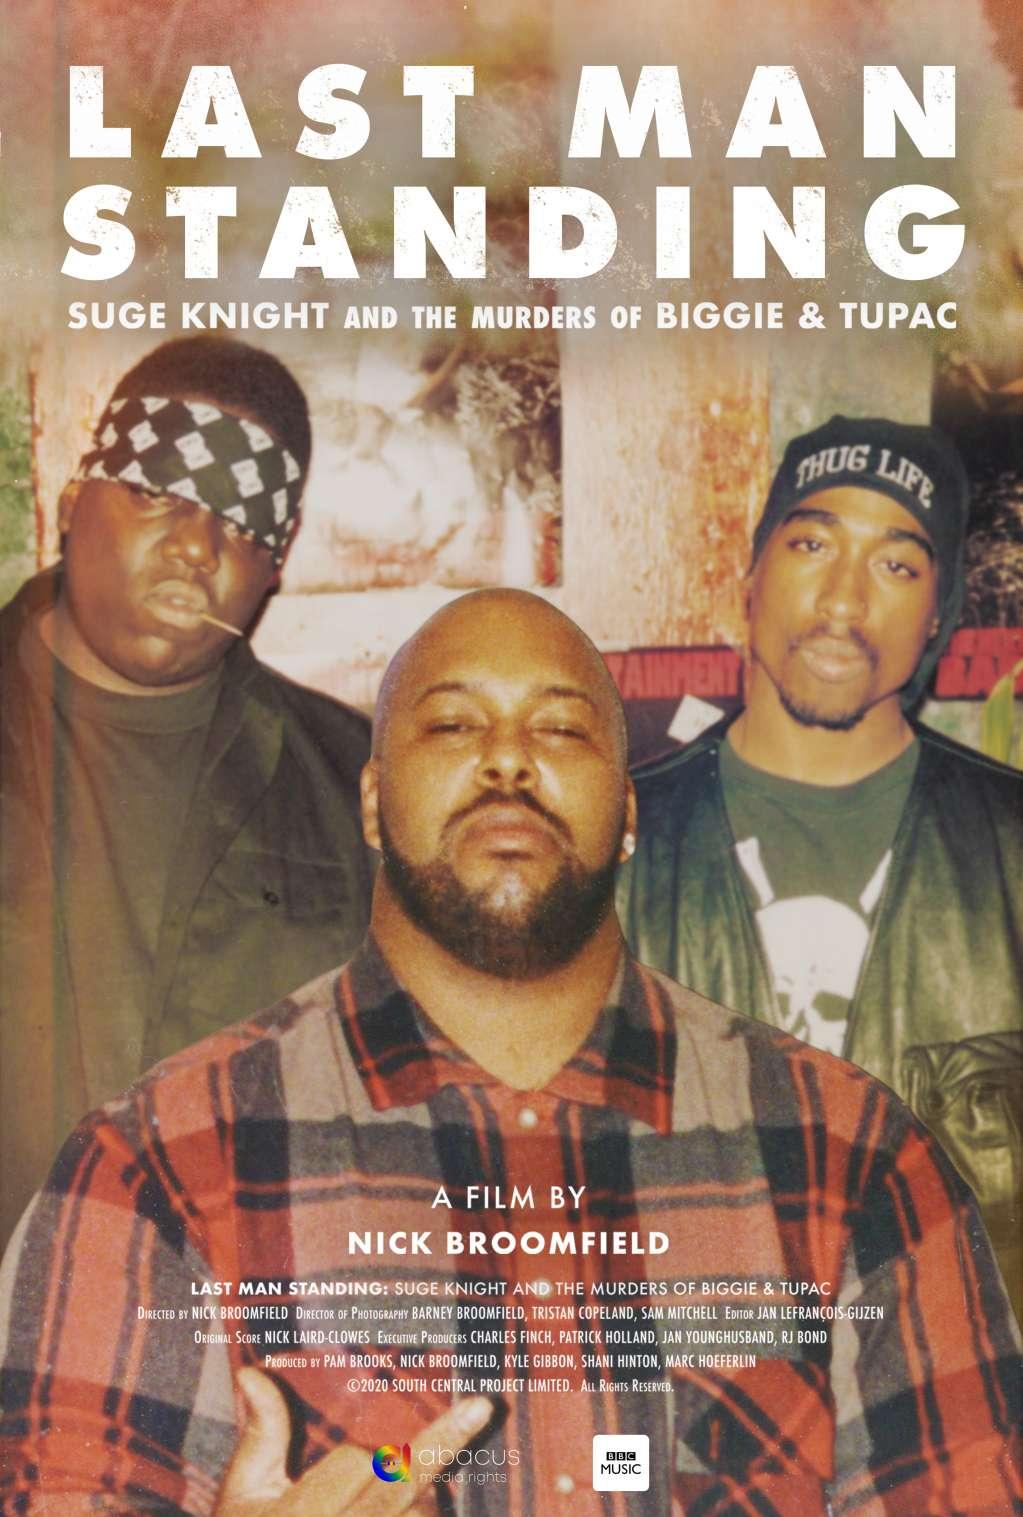 Last Man Standing: Suge Knight and the Murders of Biggie & Tupac kapak